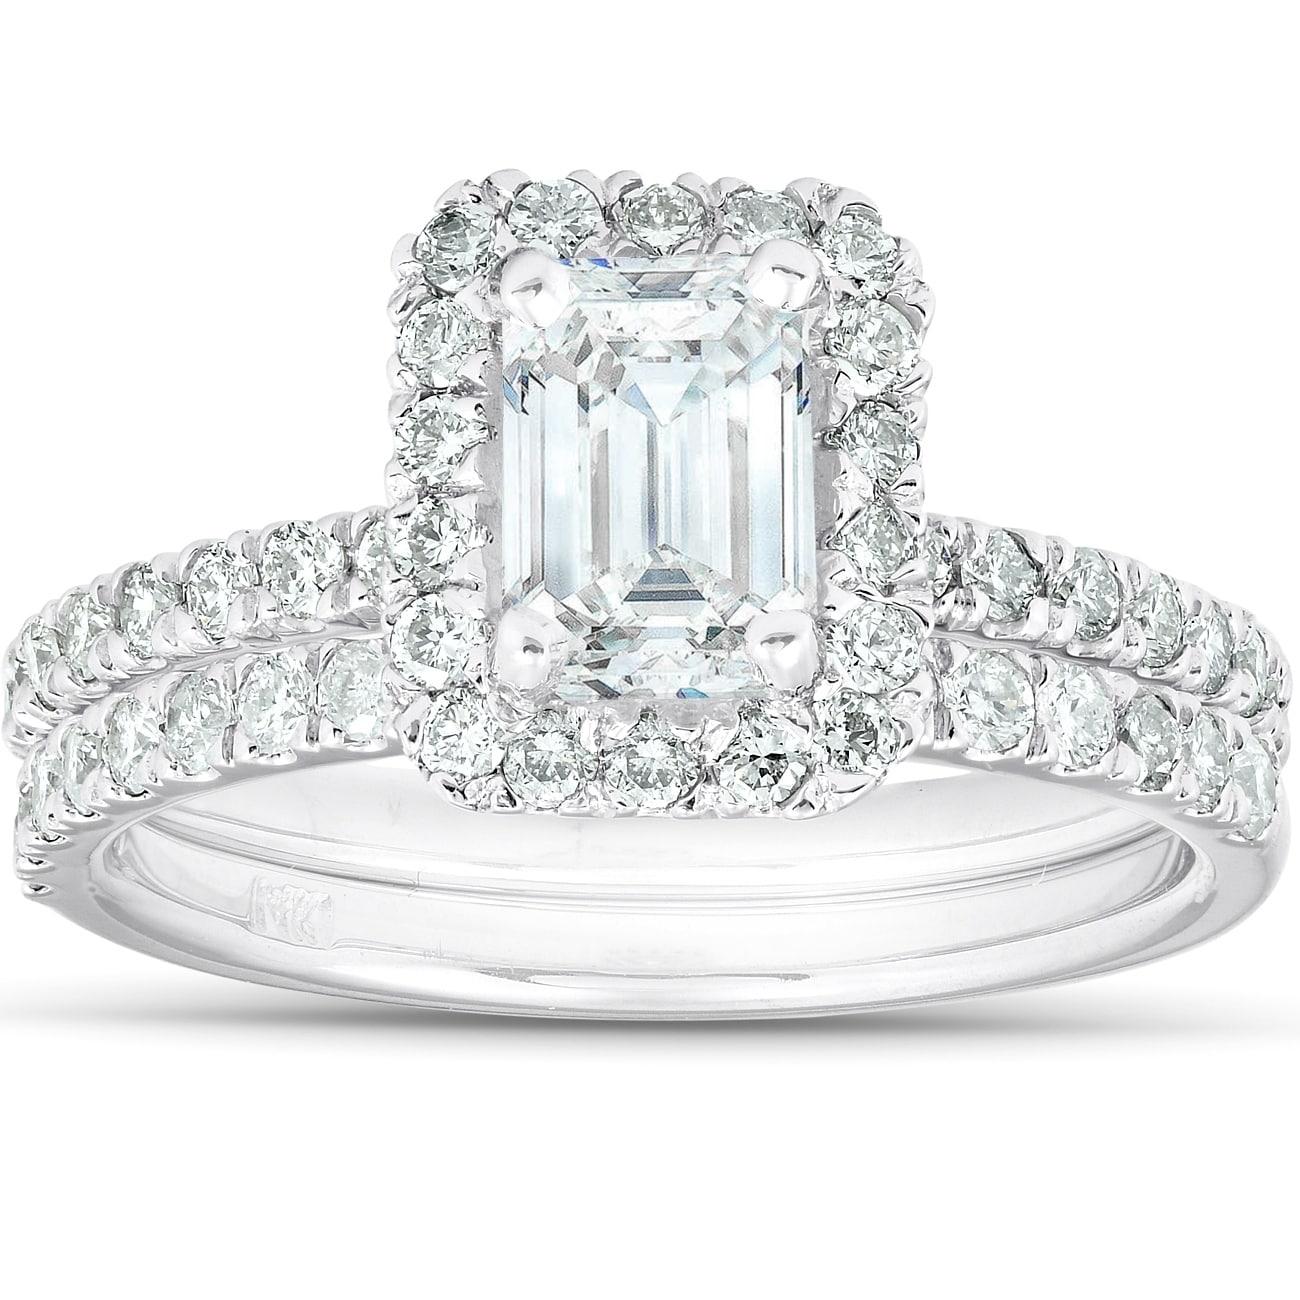 1 3 4 Ct Emerald Cut Diamond Halo Engagement Wedding Ring Set 14k White Gold Overstock 28736150